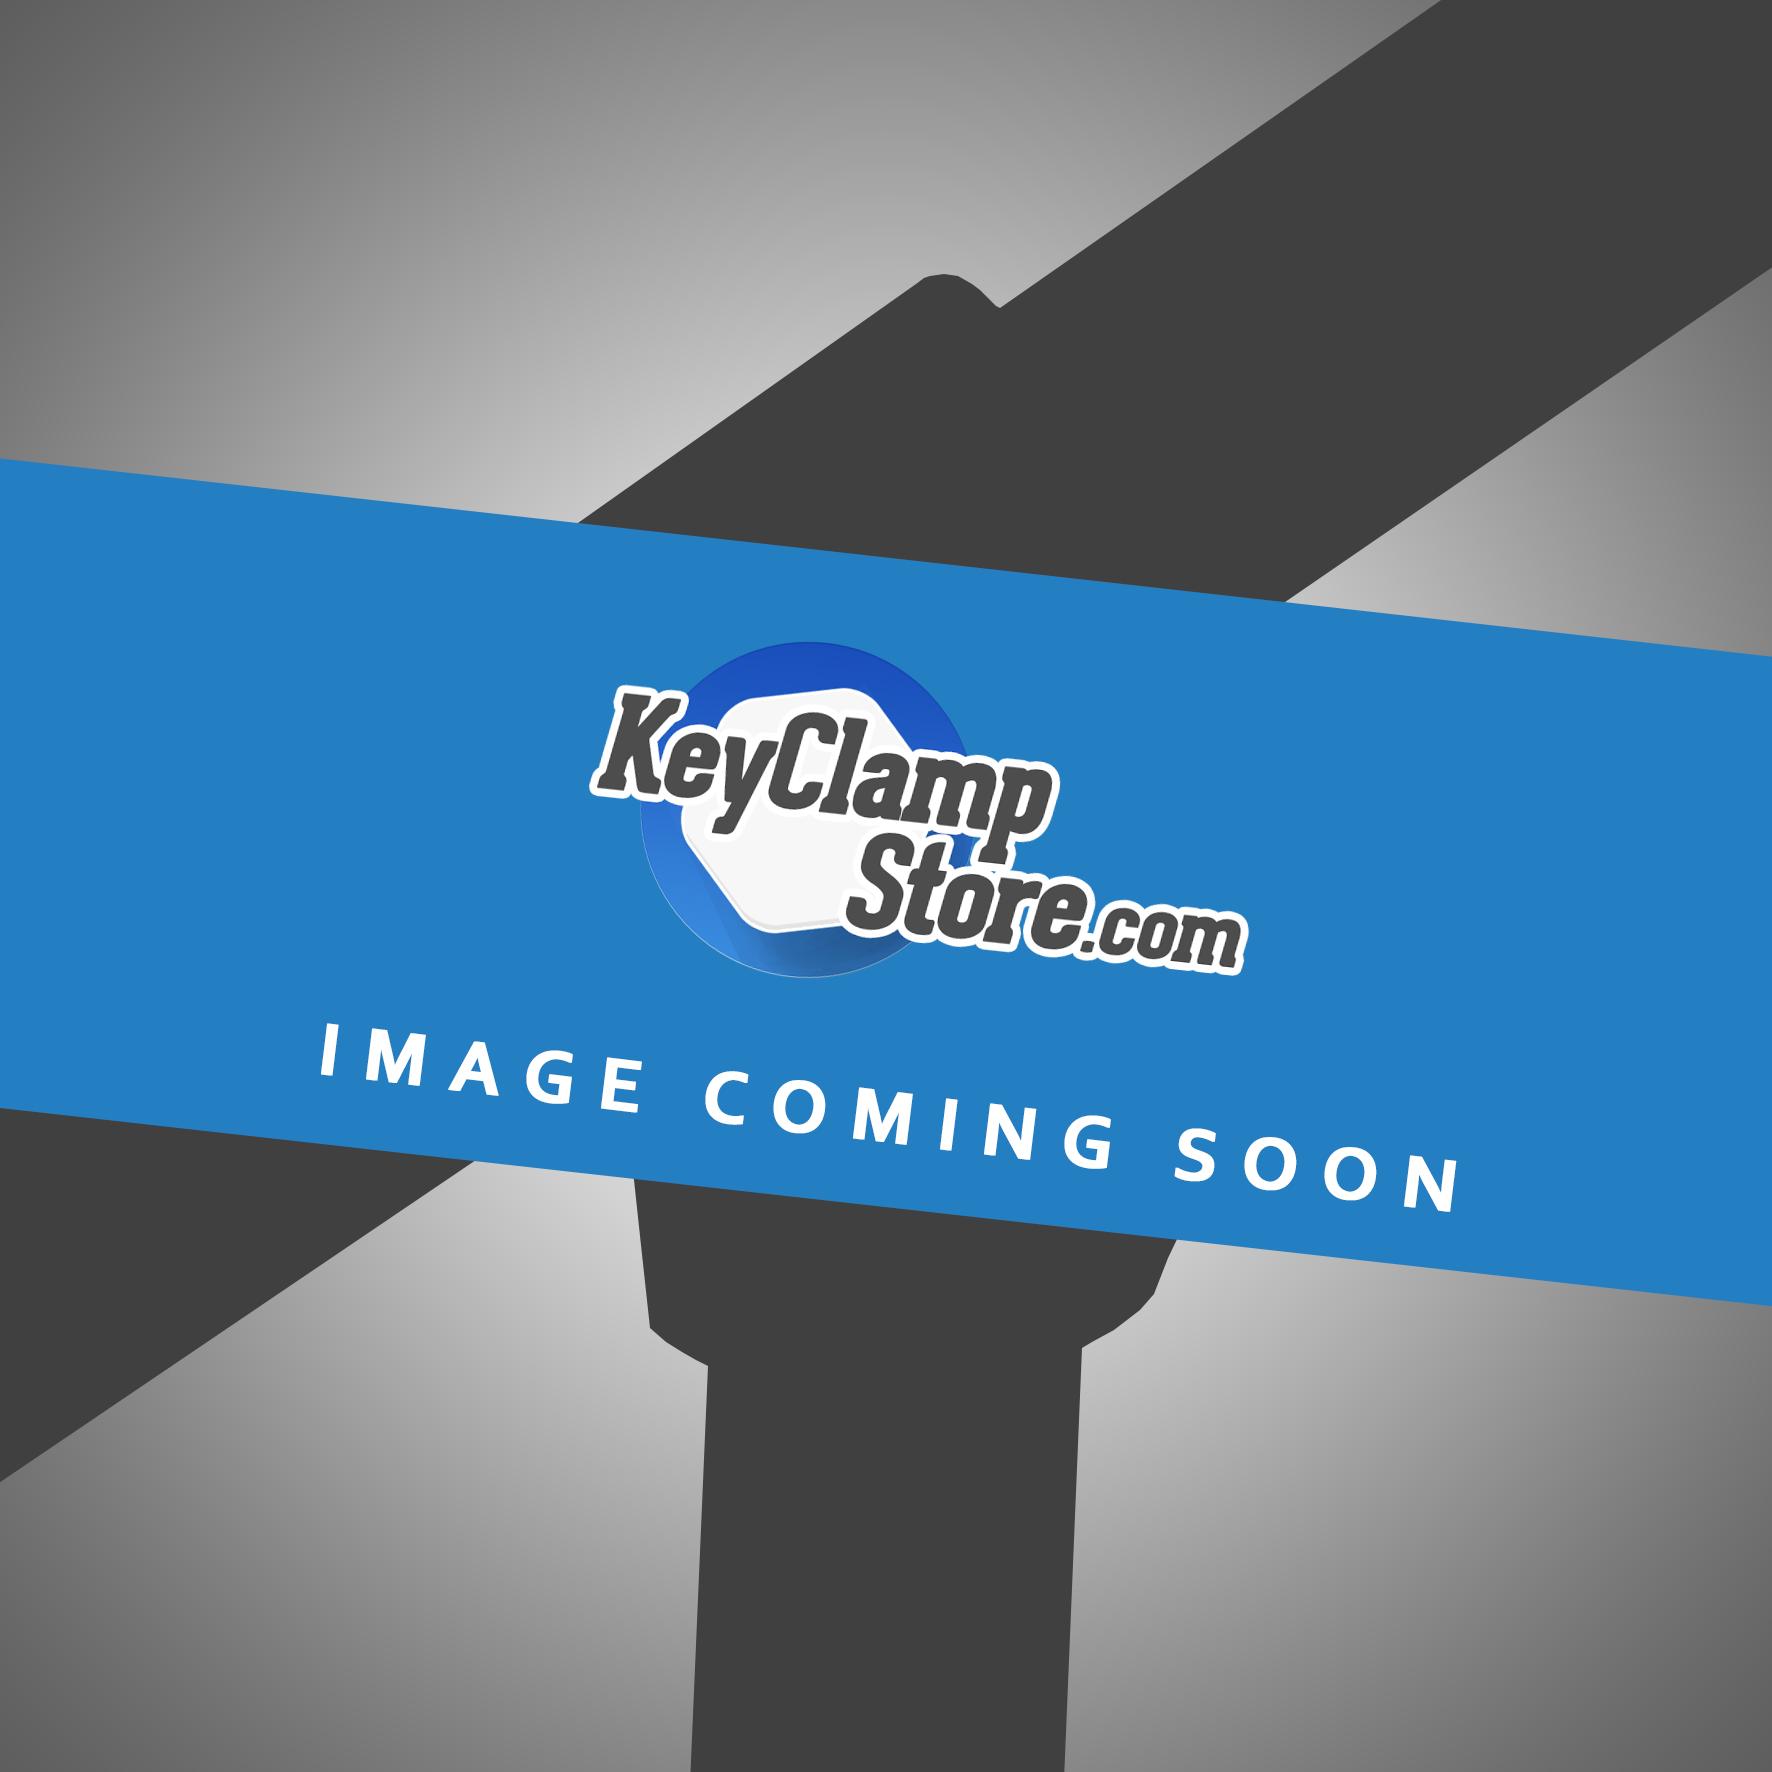 27mm Key Clamp Handrailing Fittings